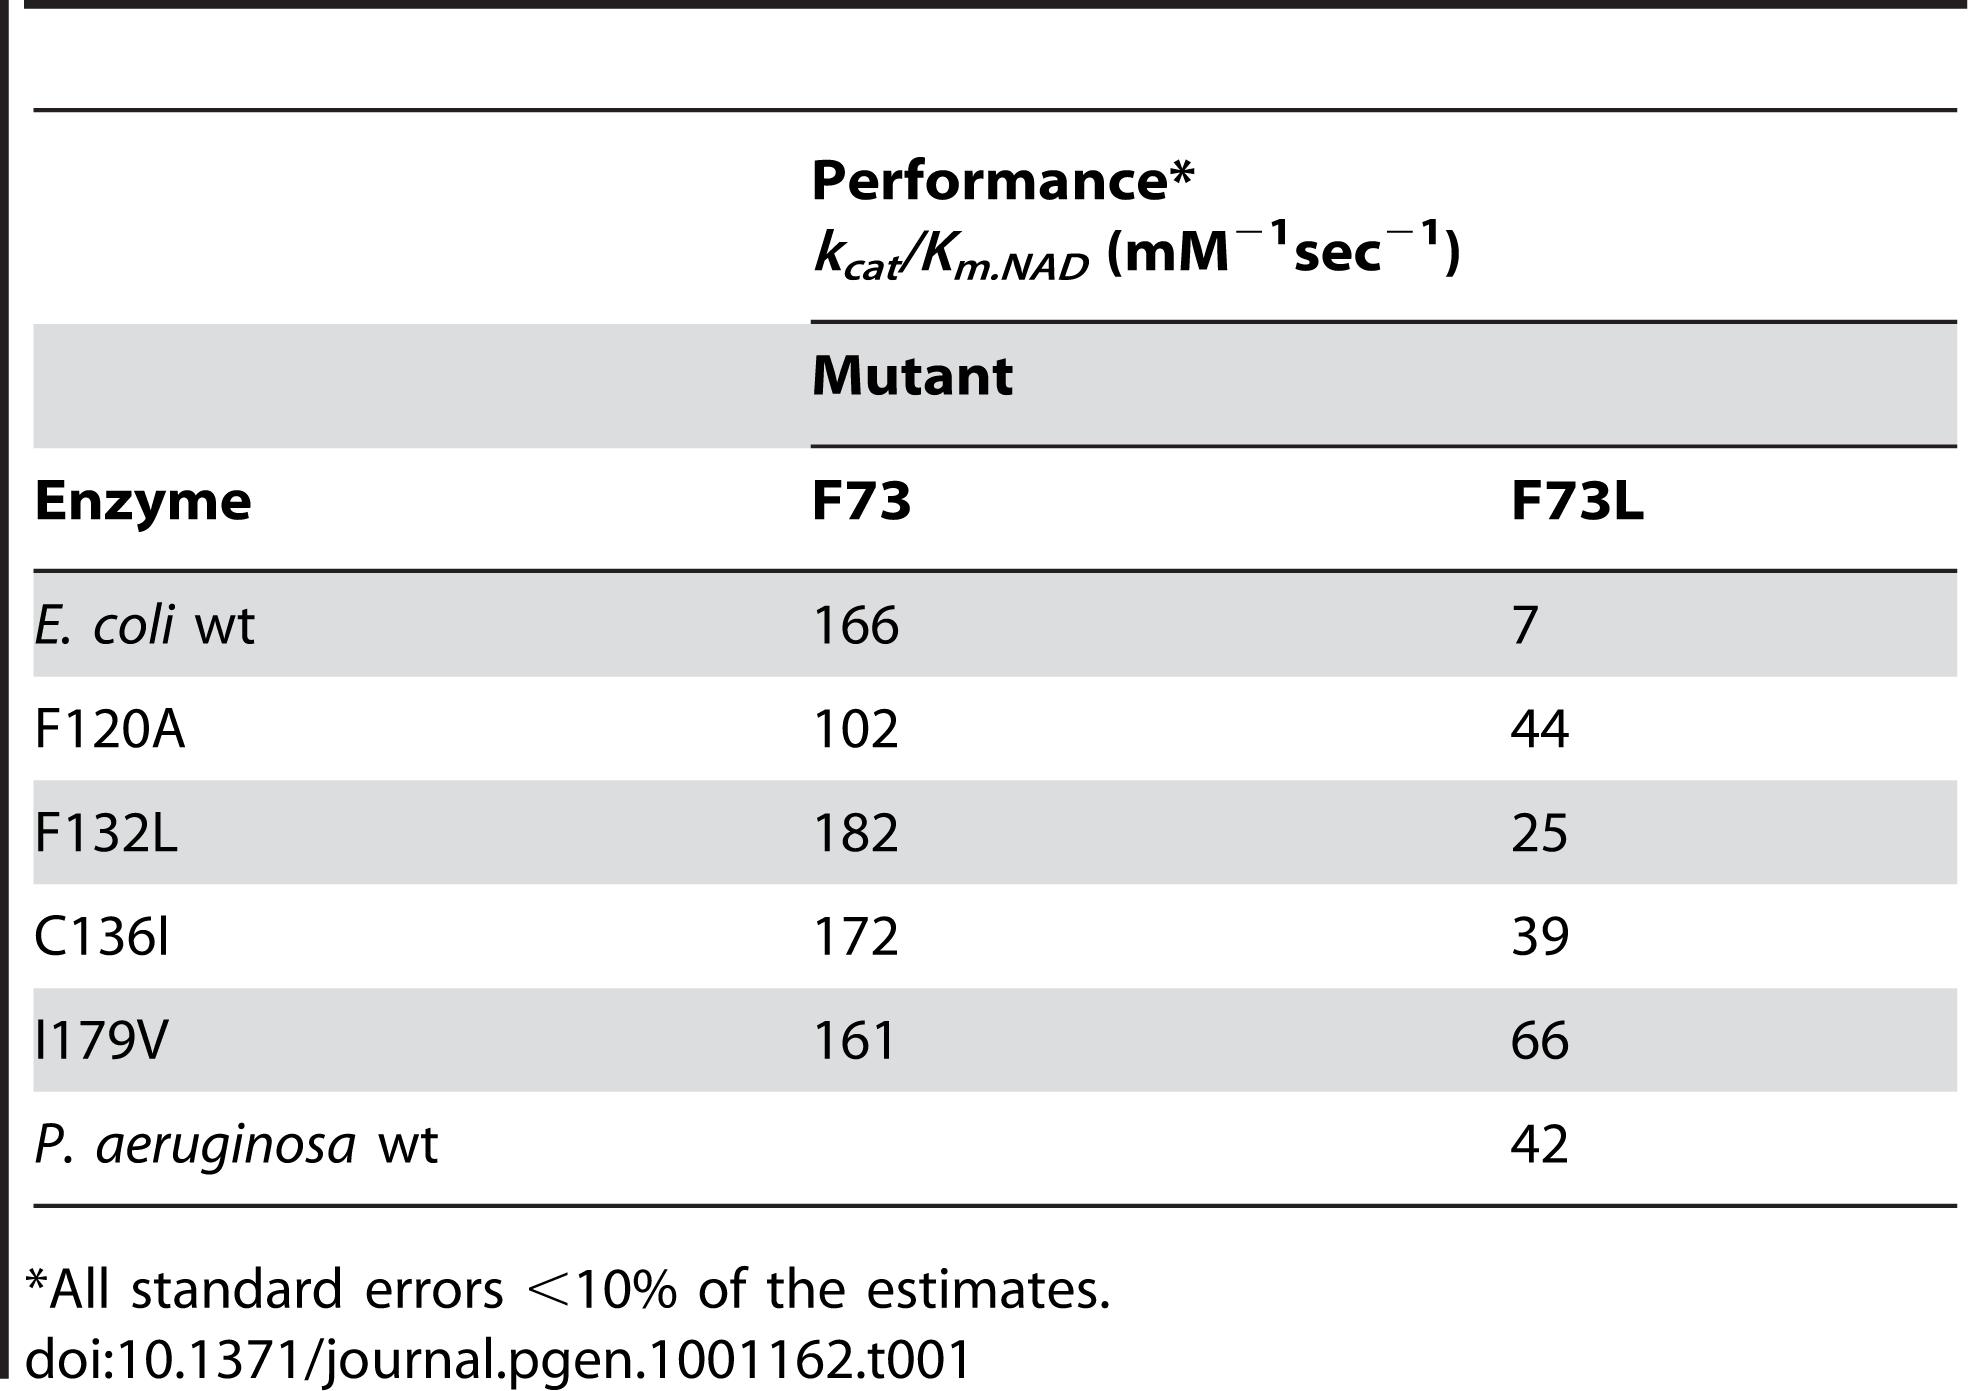 Performance of mutants towards NAD.